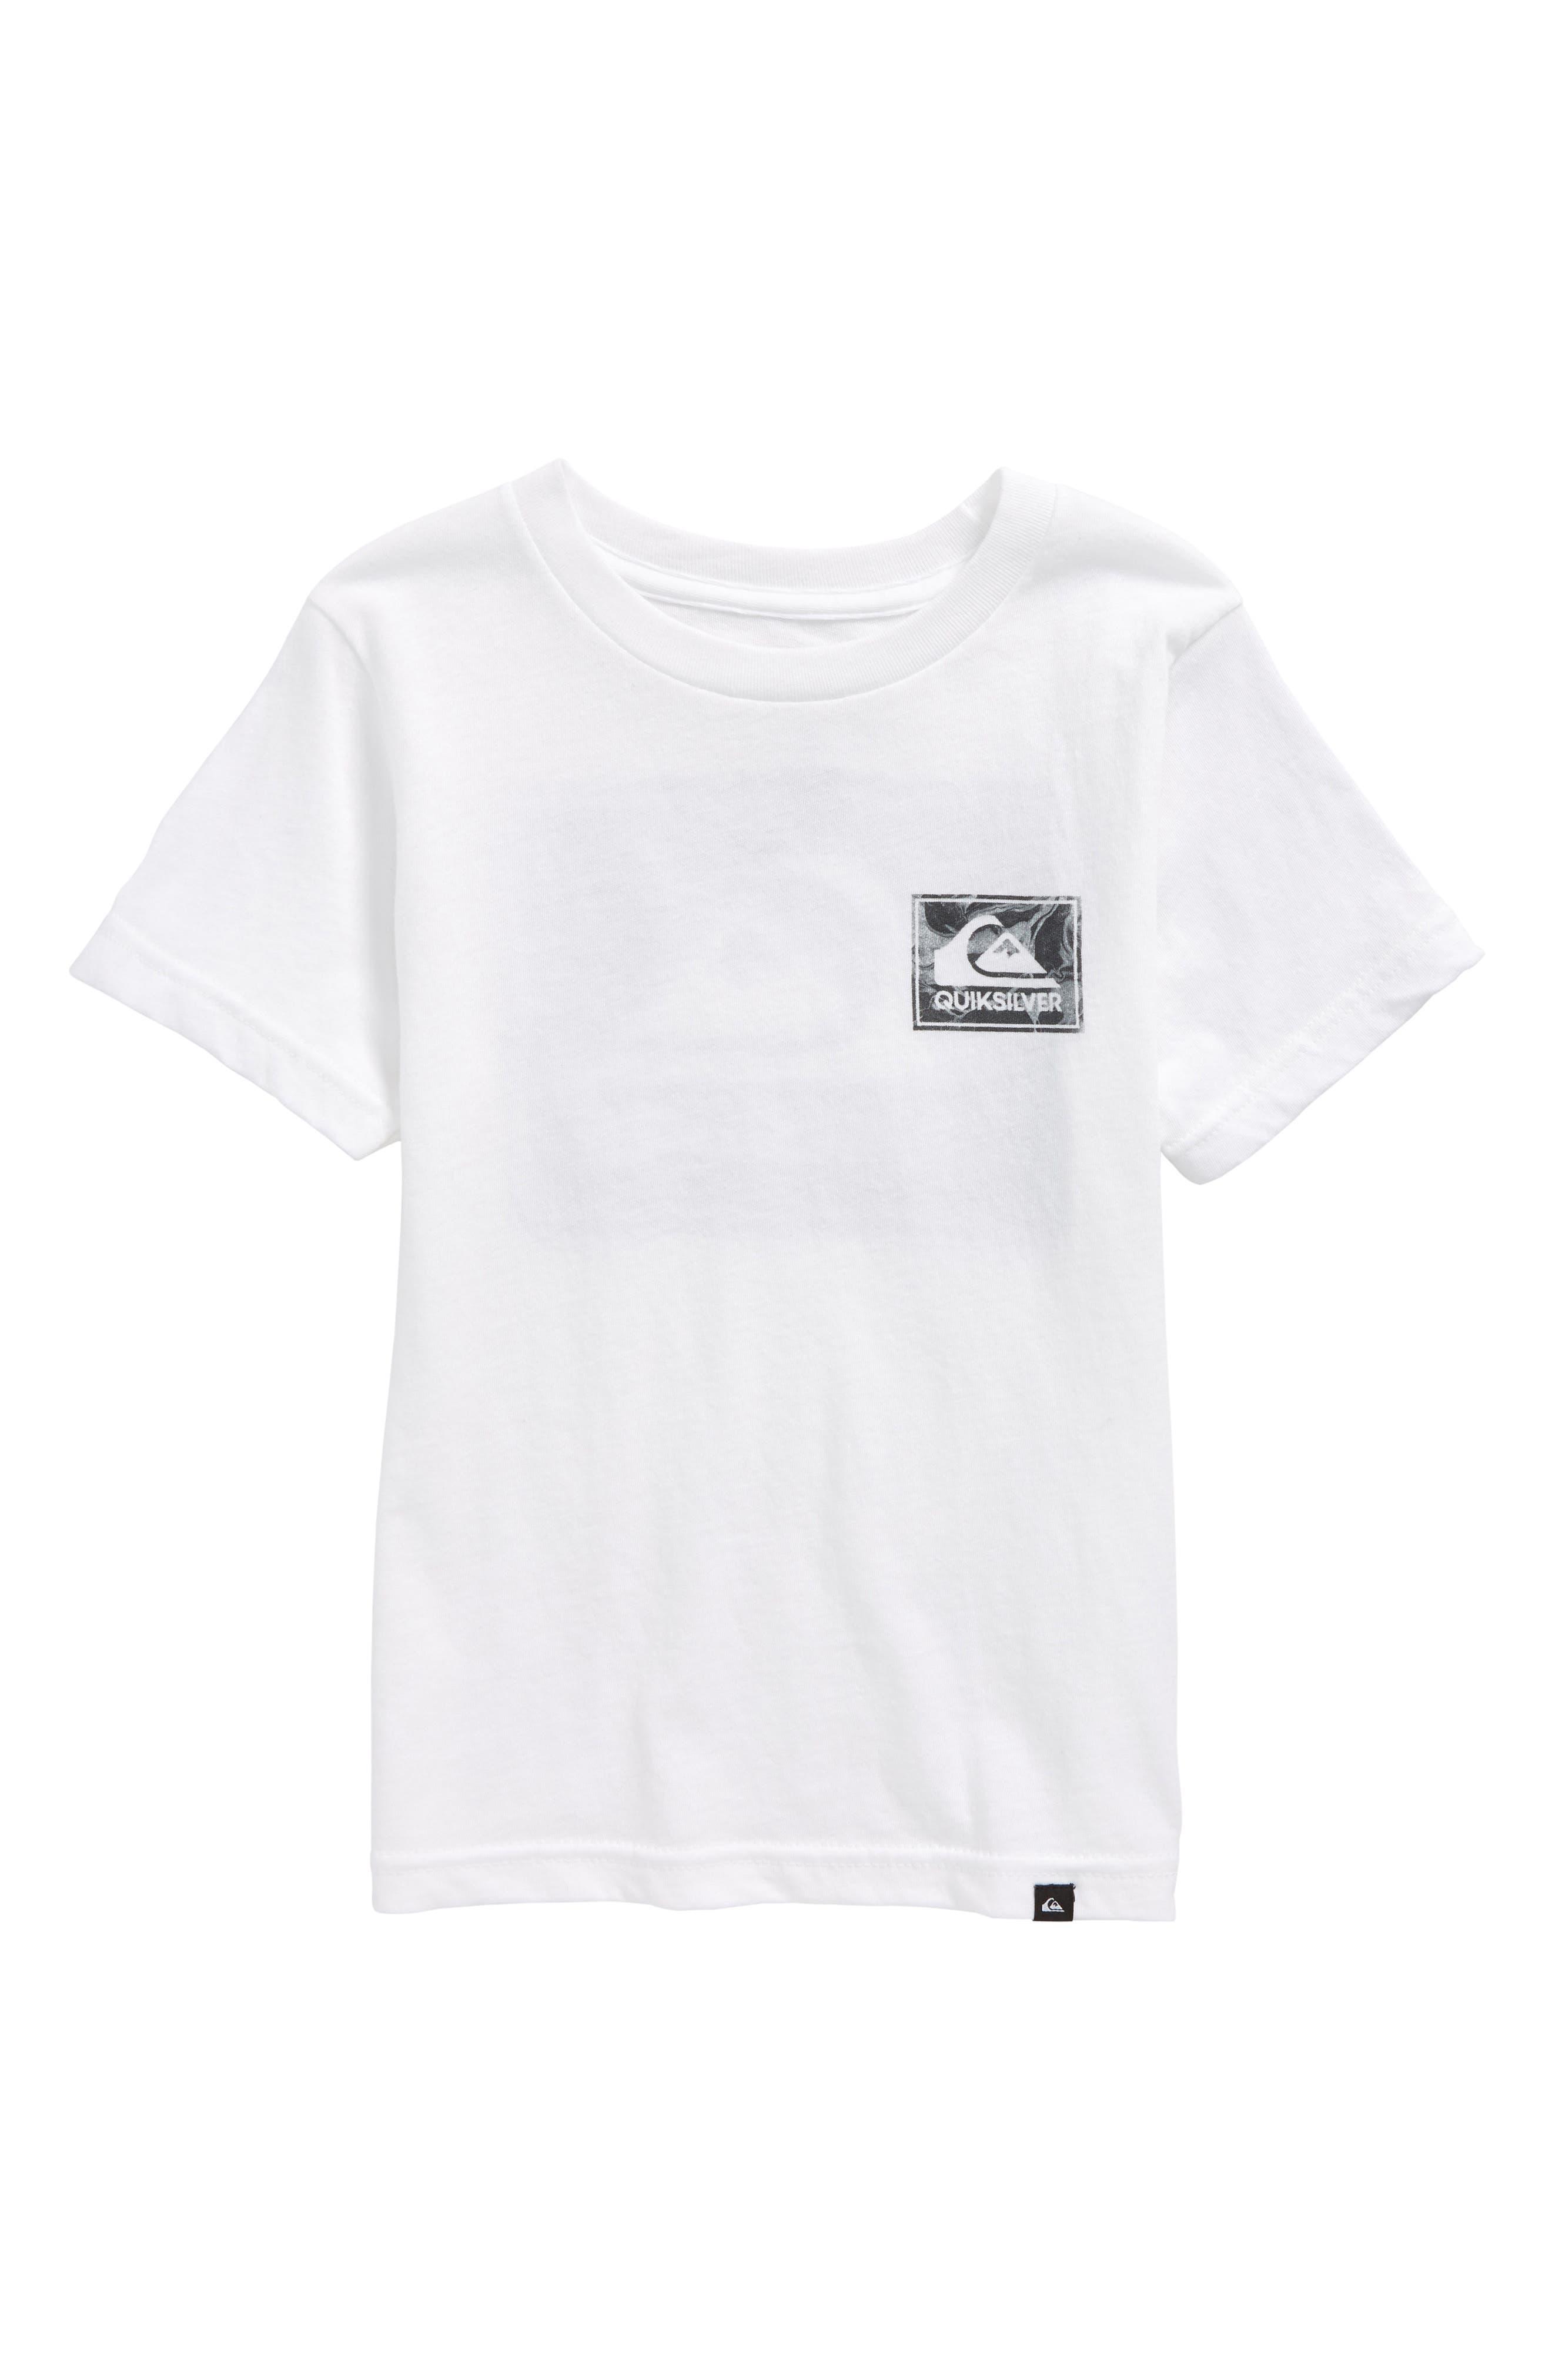 Volcano Blues T-Shirt,                         Main,                         color, White